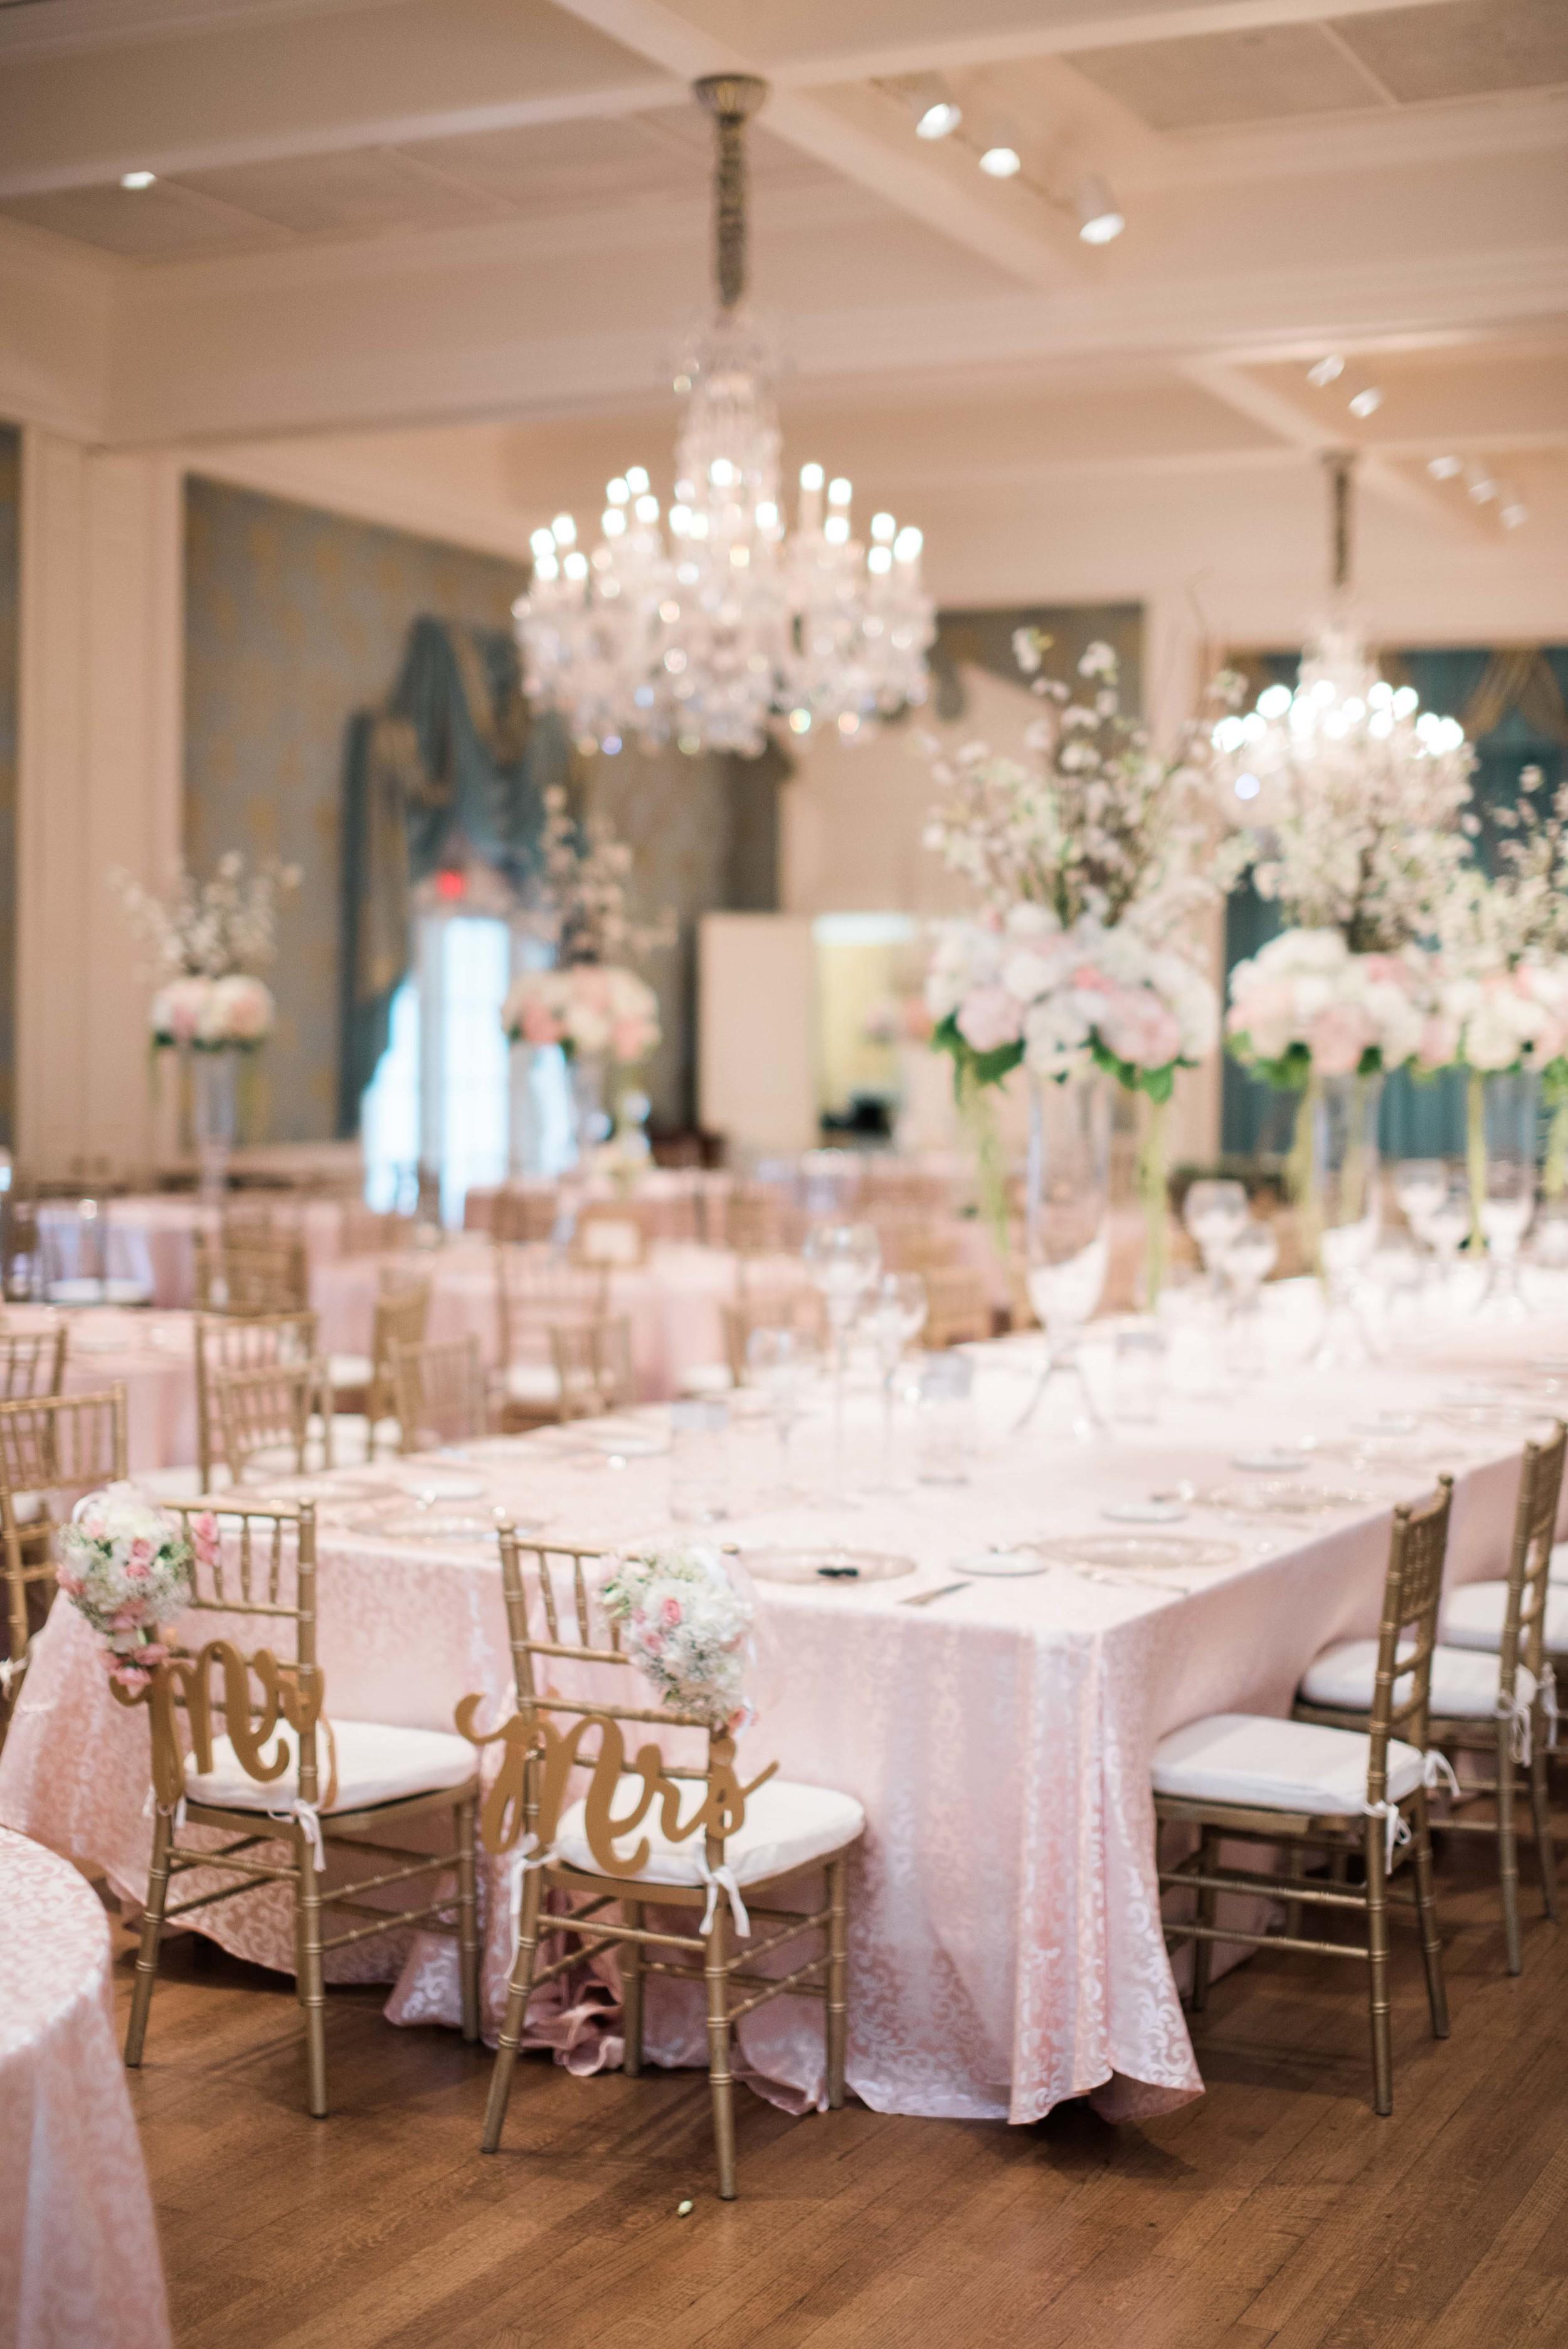 Dana-Fernandez-Photography-Weddings-in-Houston-Magazine-feature-Houston-wedding-photographer-film-37.jpg